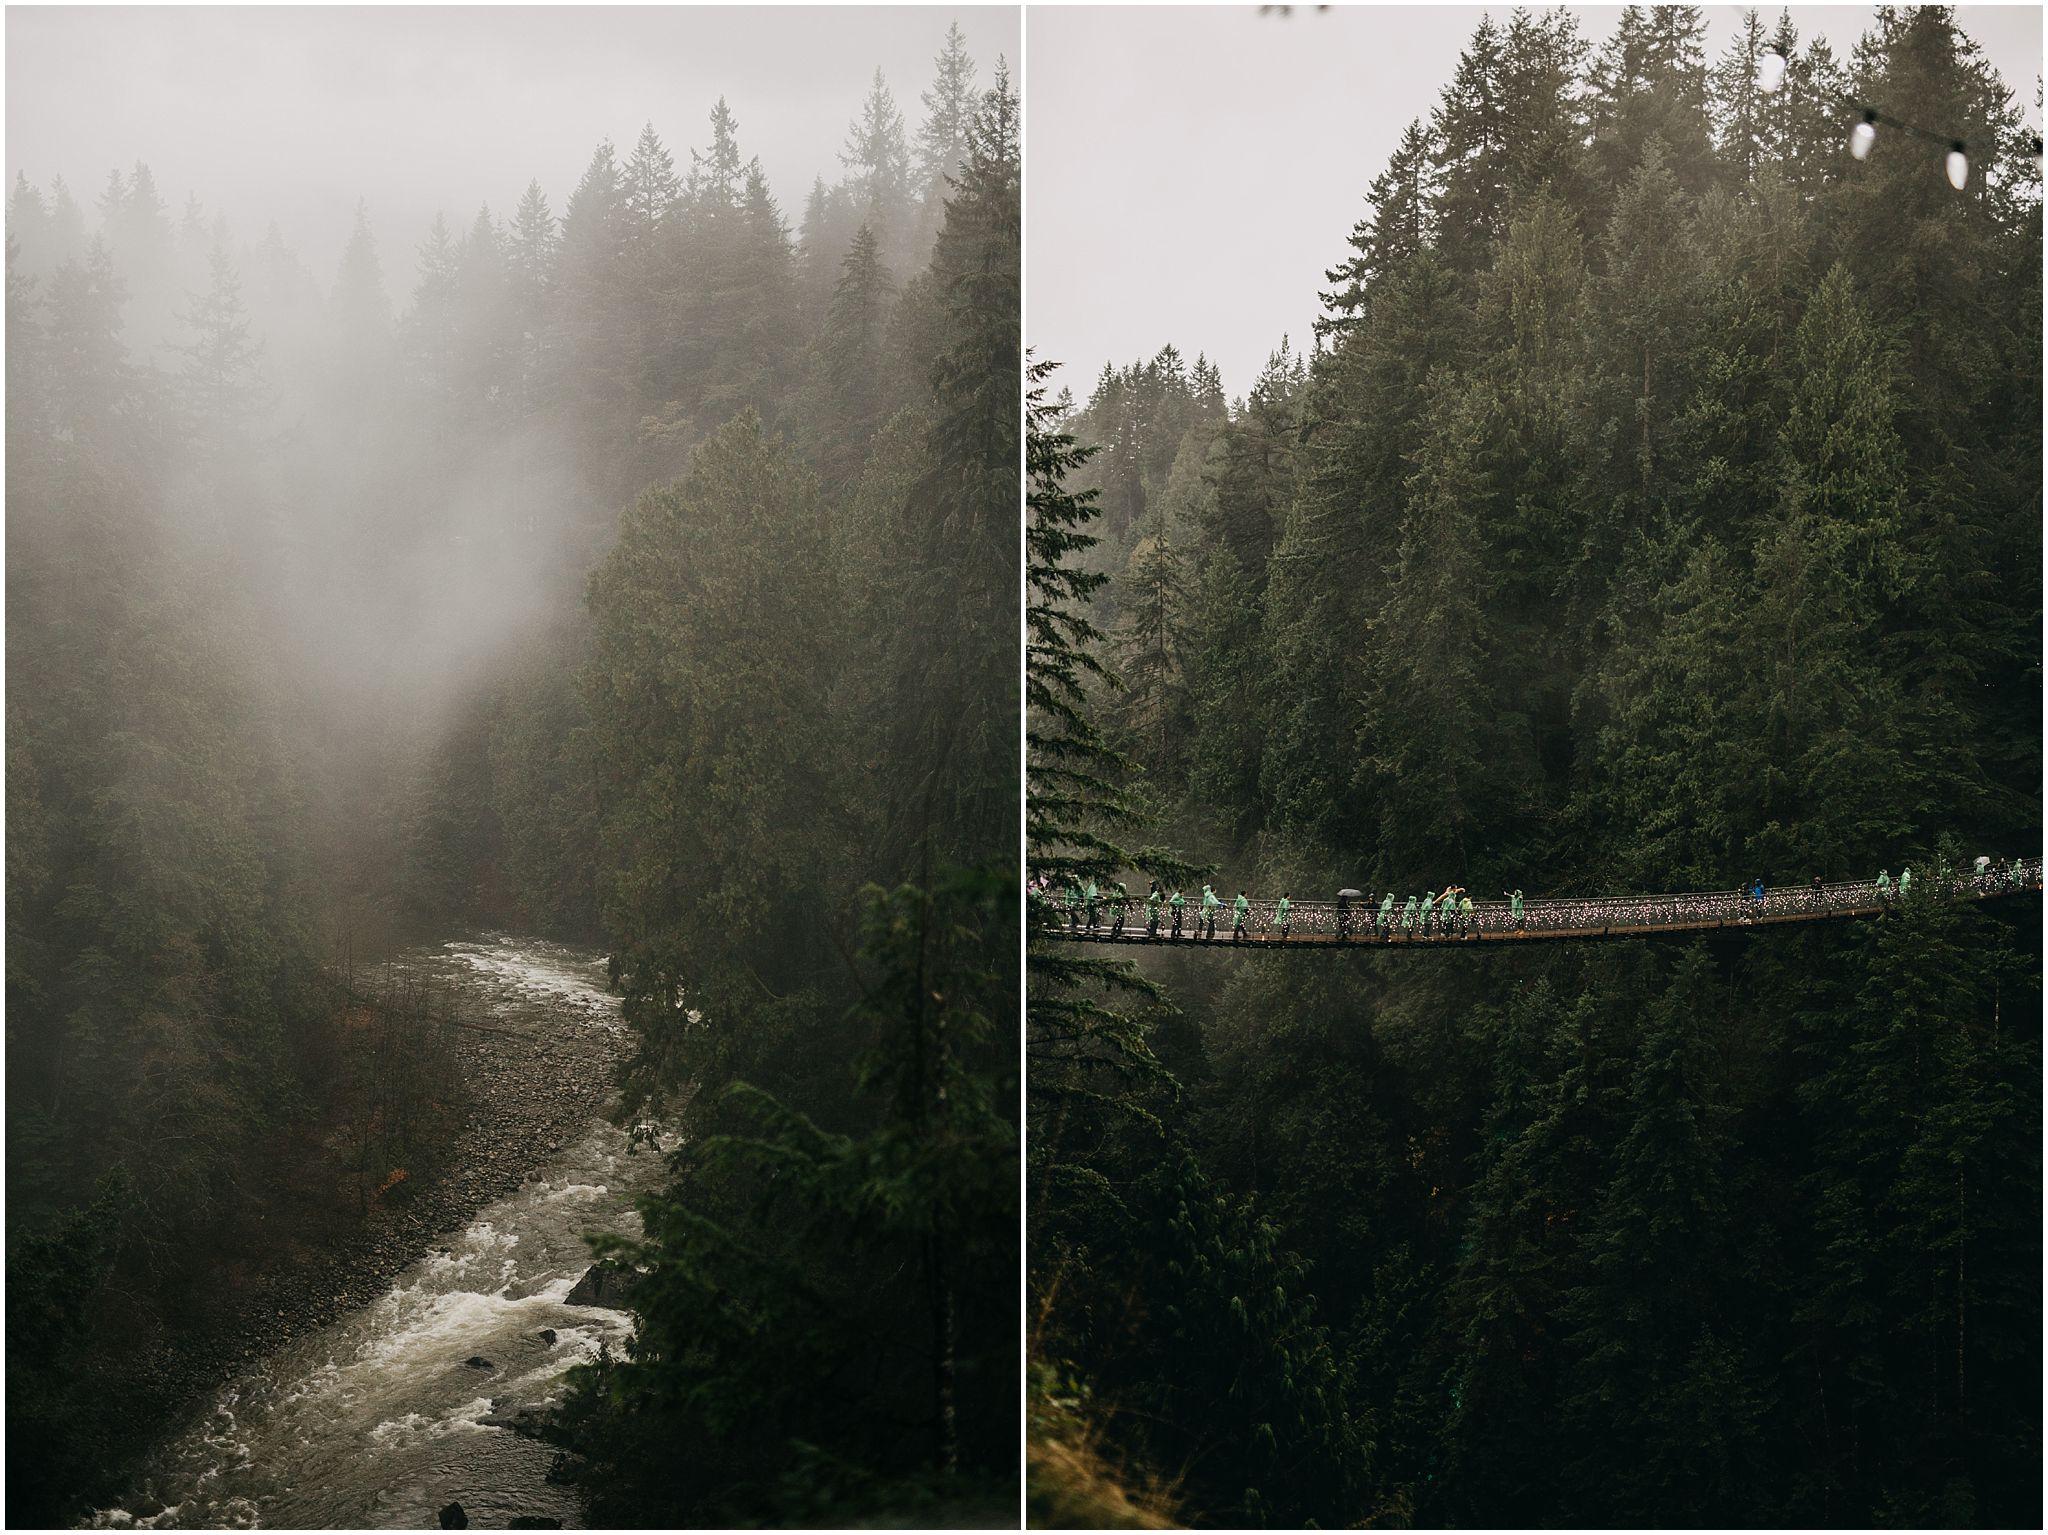 capilano suspension bridge rainy foggy beautiful pnw vibes